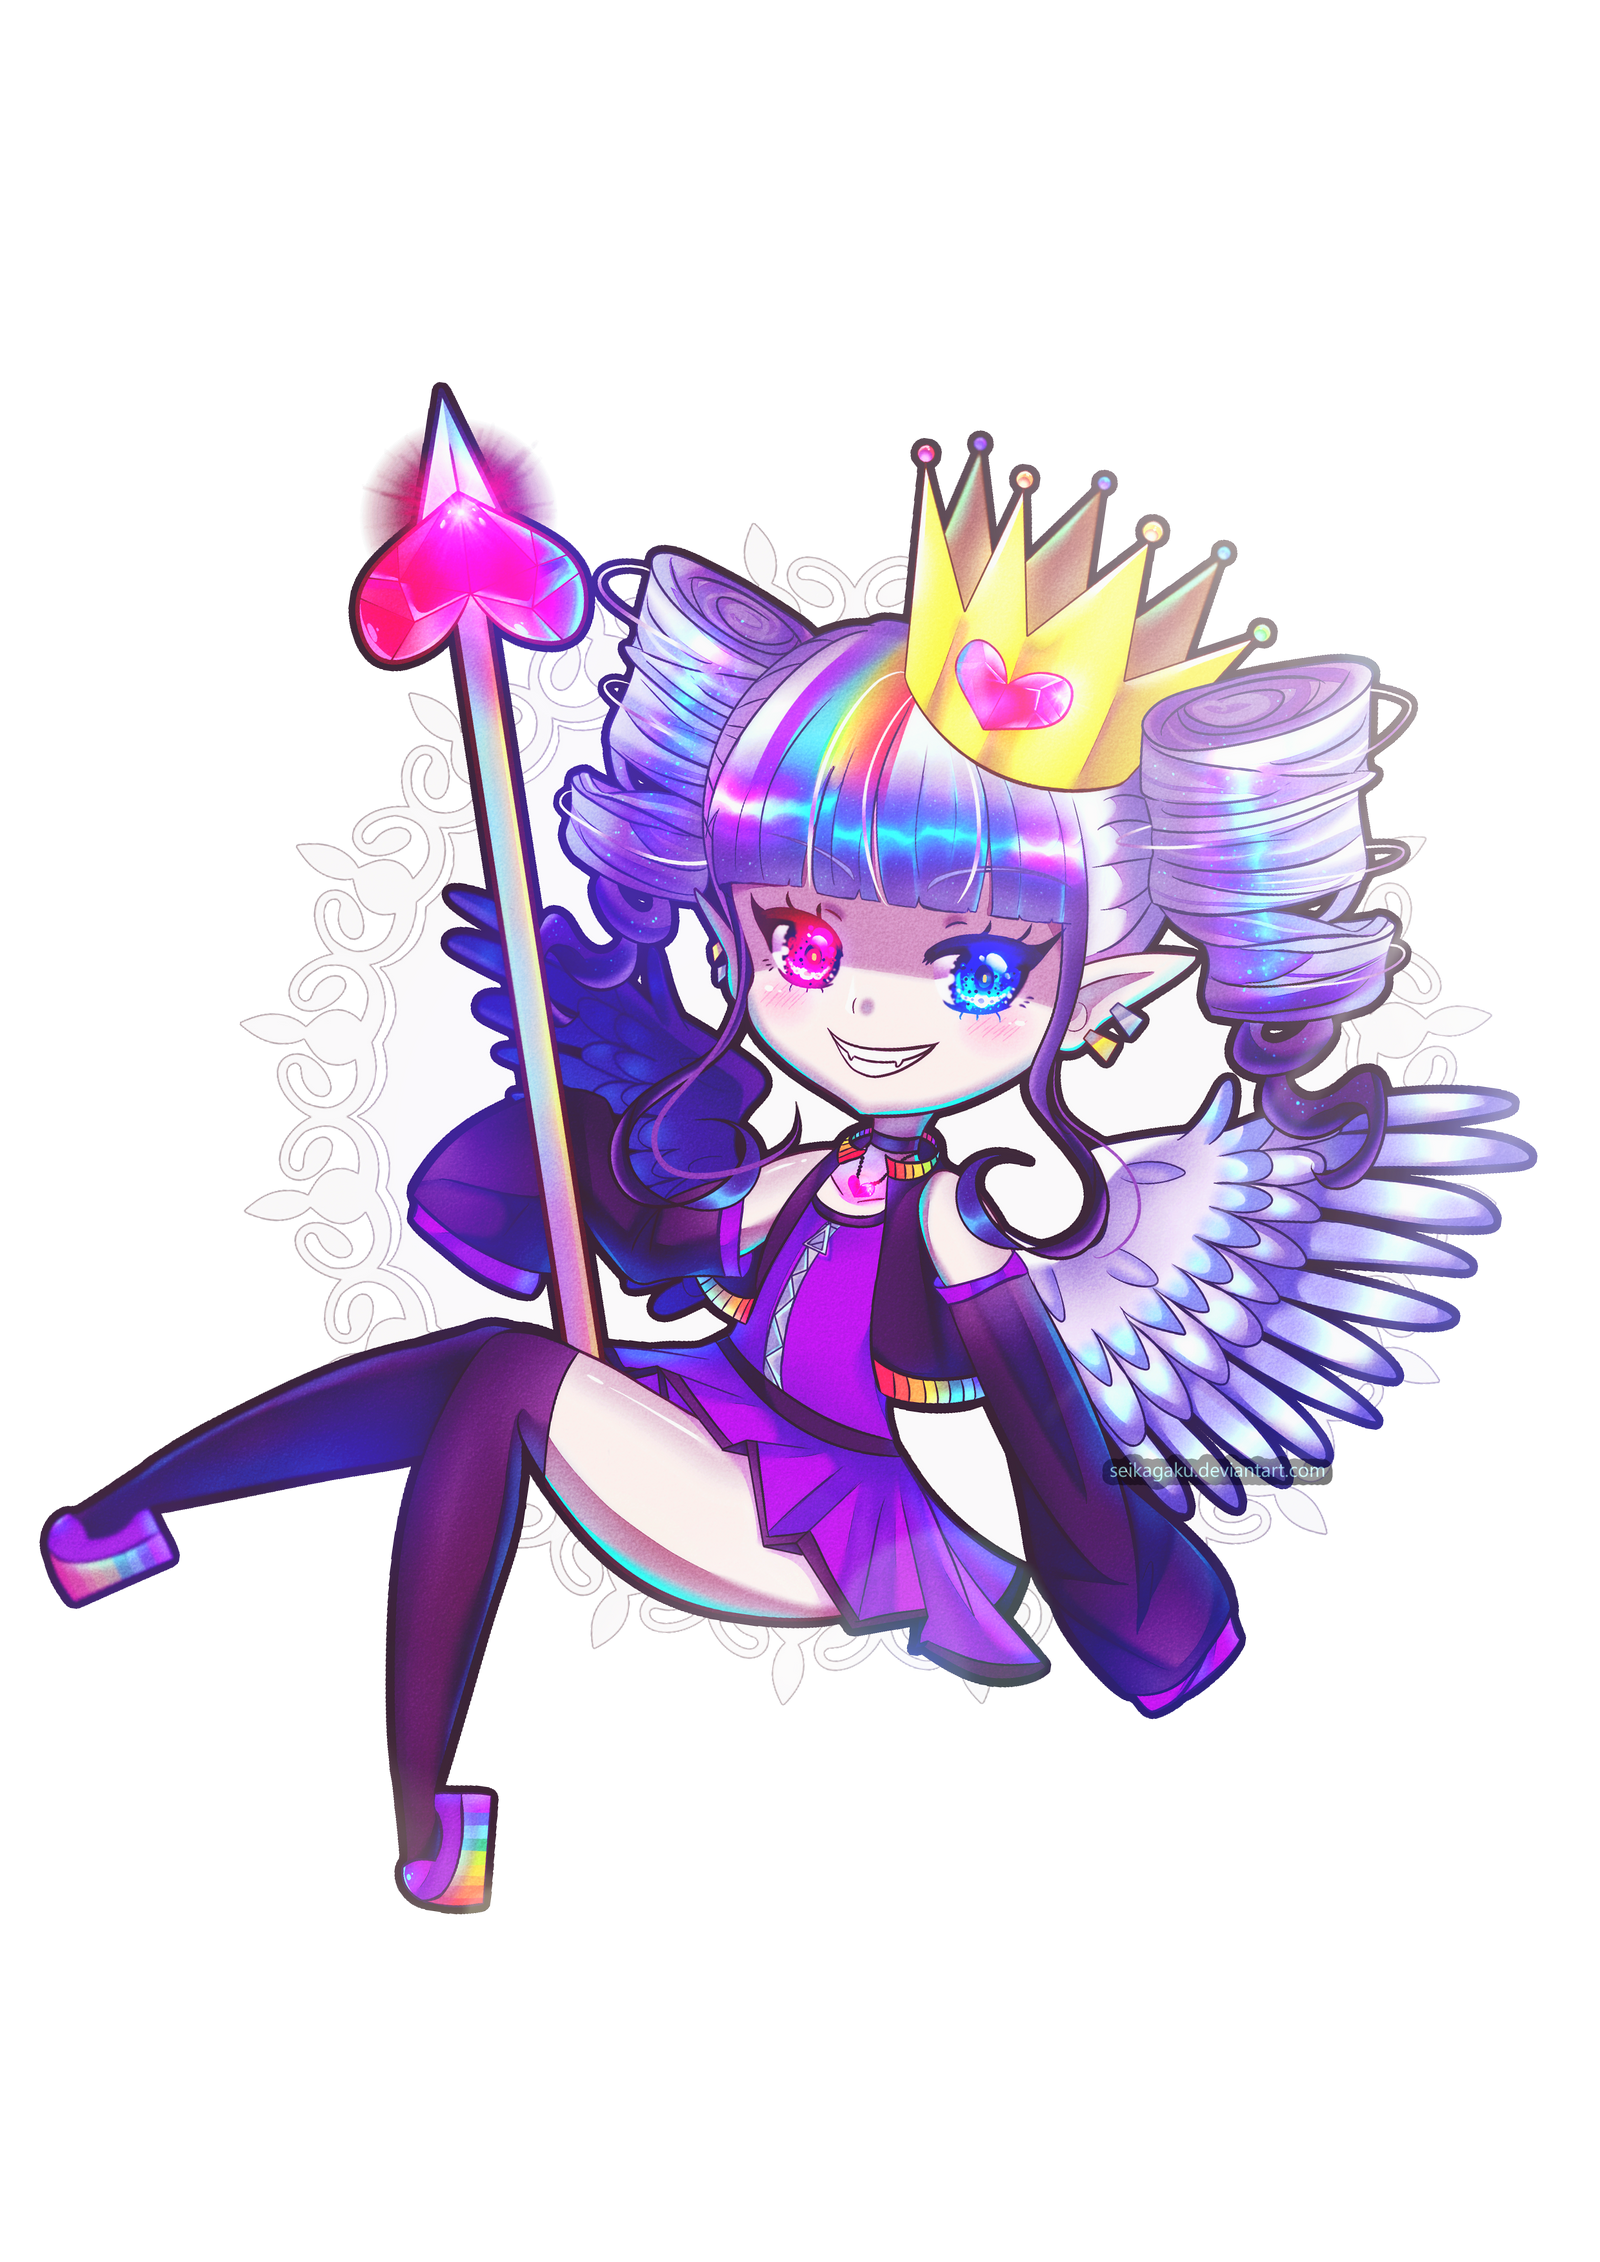 Alizee by Seikagaku